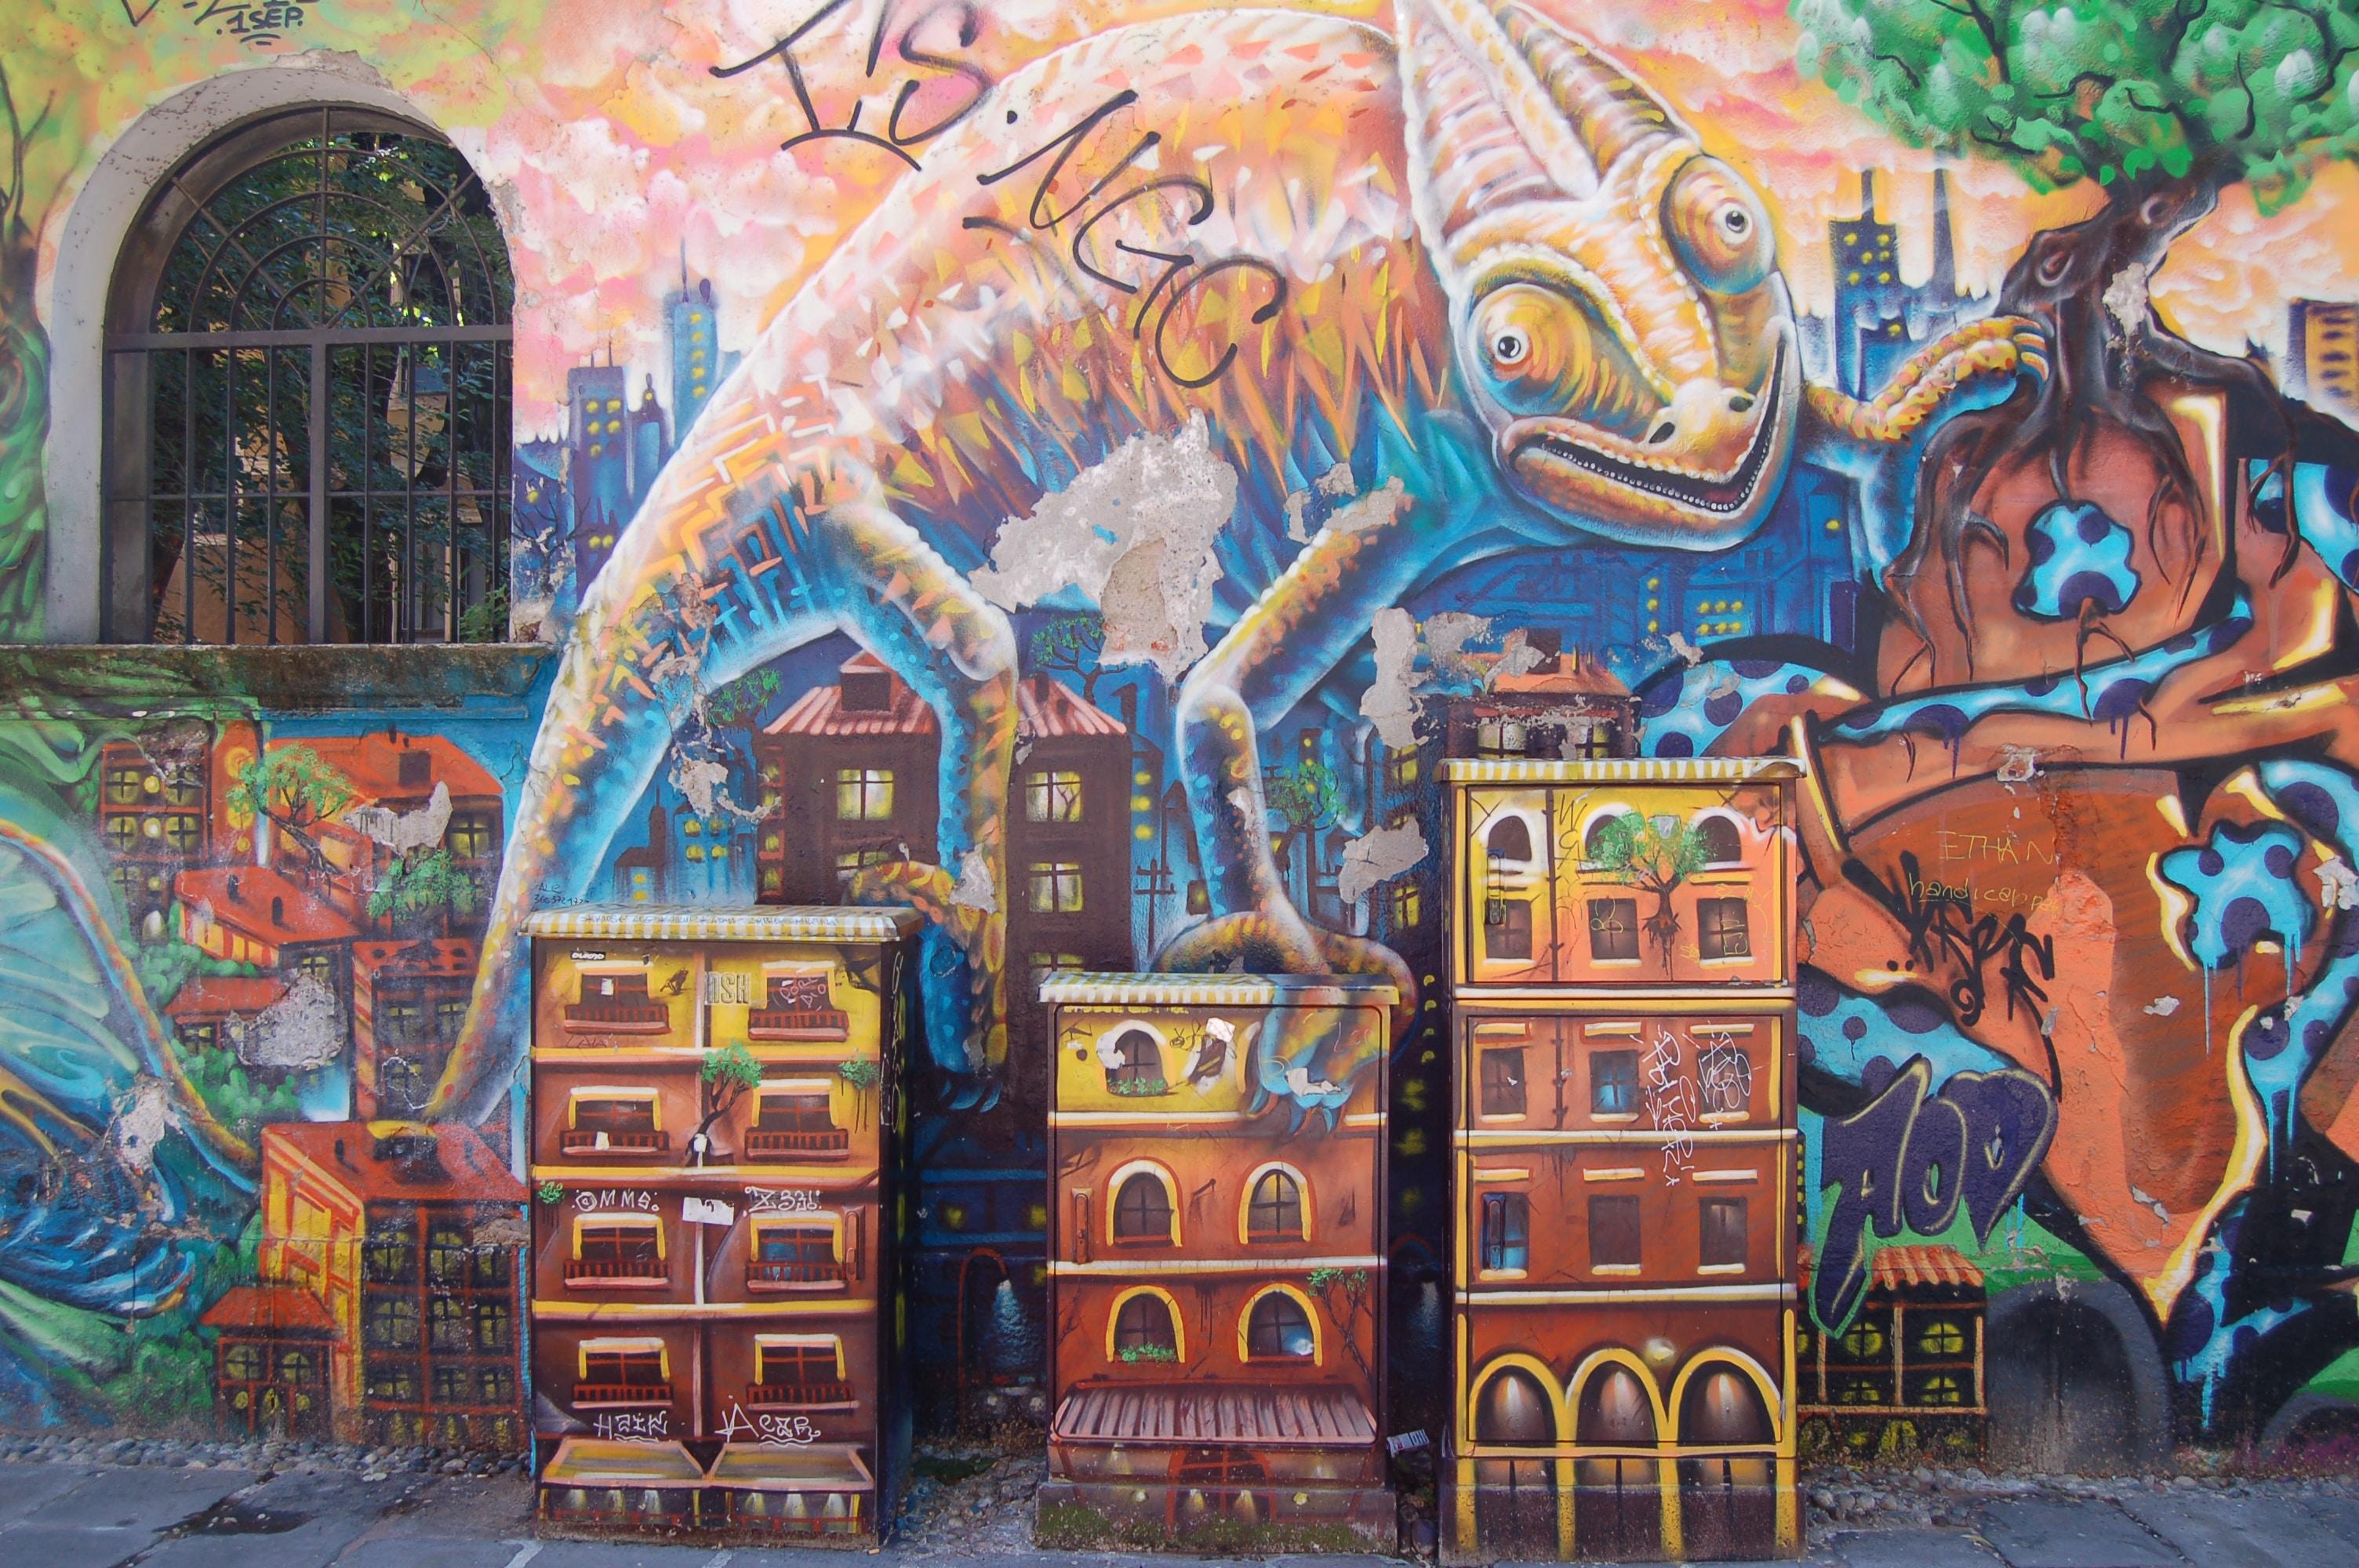 A wall mural of an oversized gecko climbing over tall city buildings.